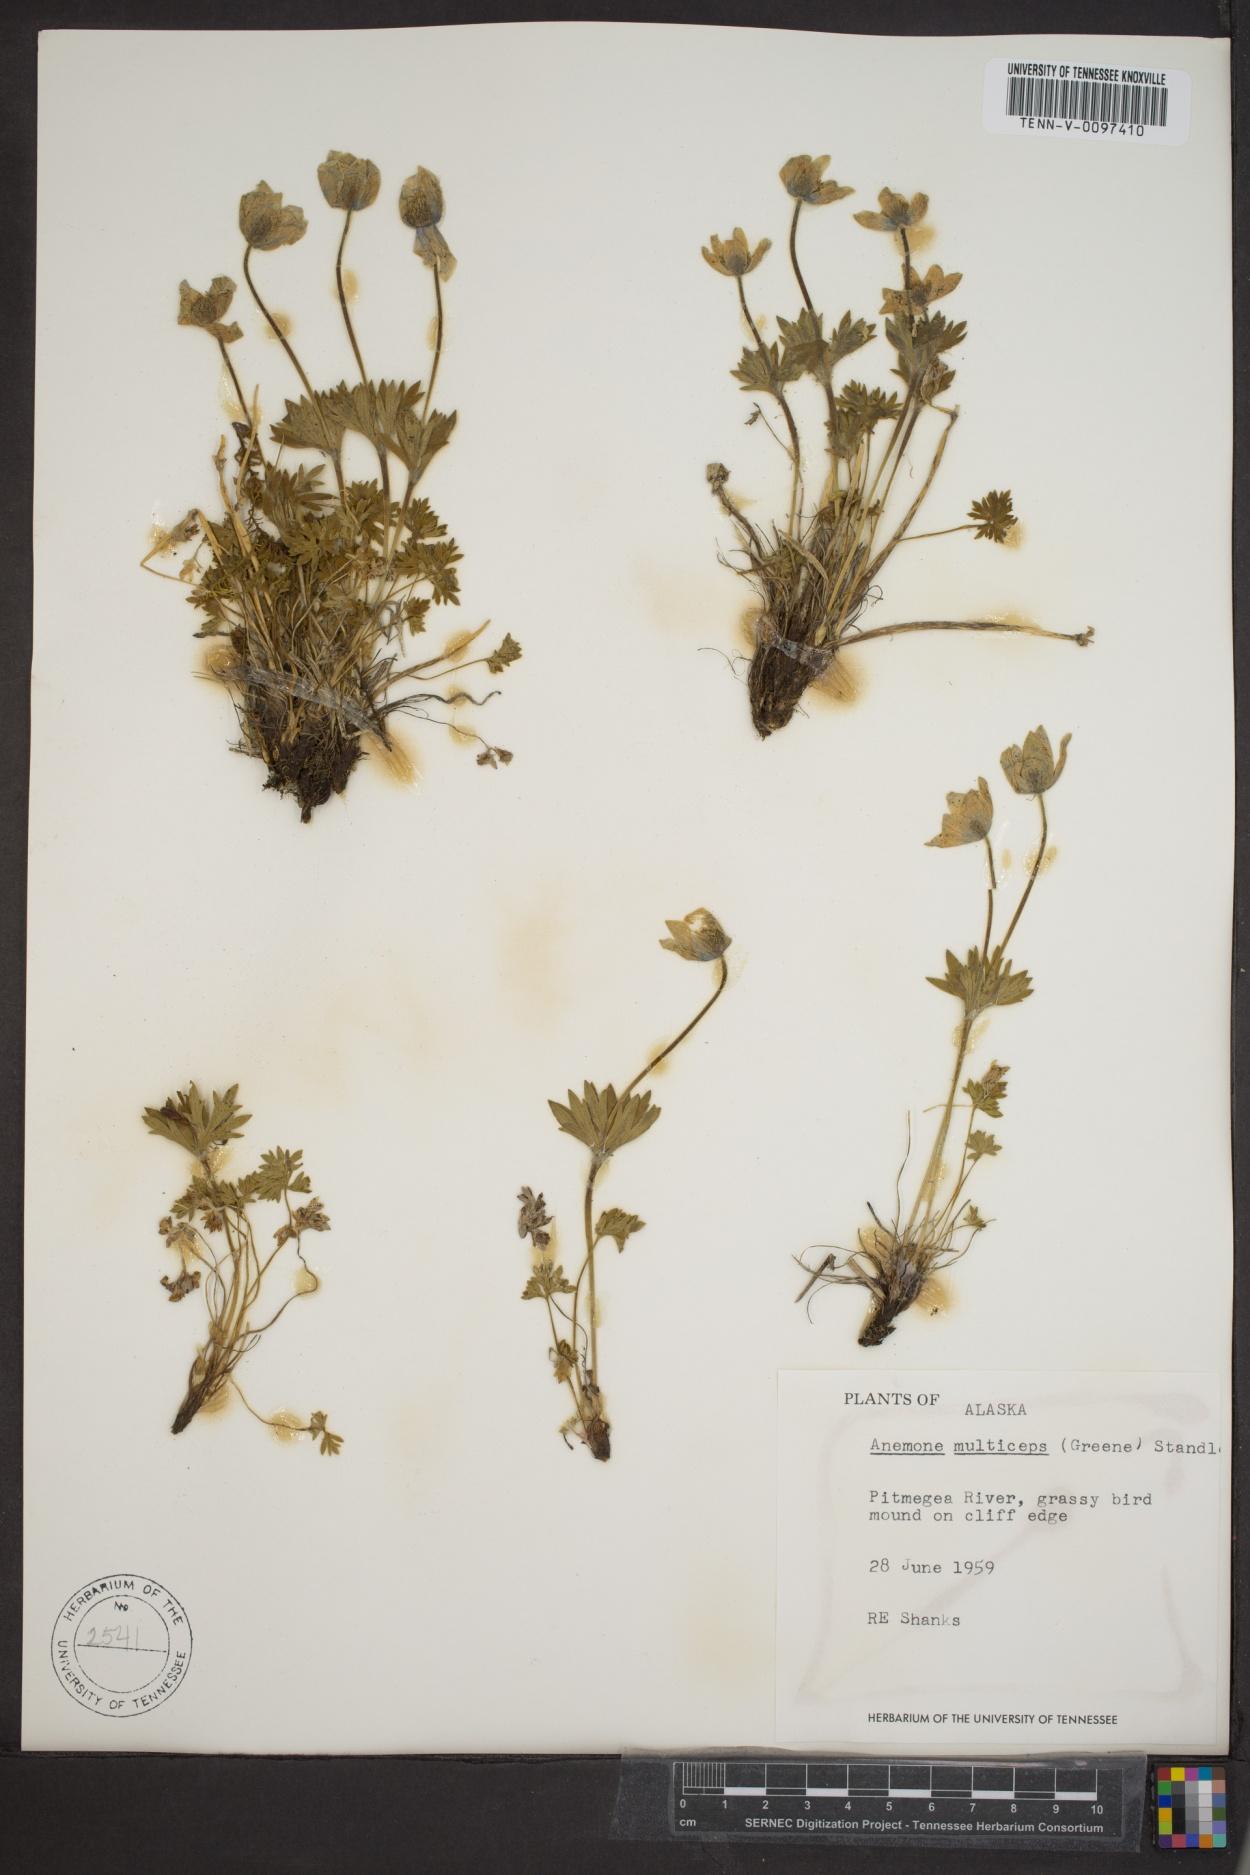 Anemone multiceps image